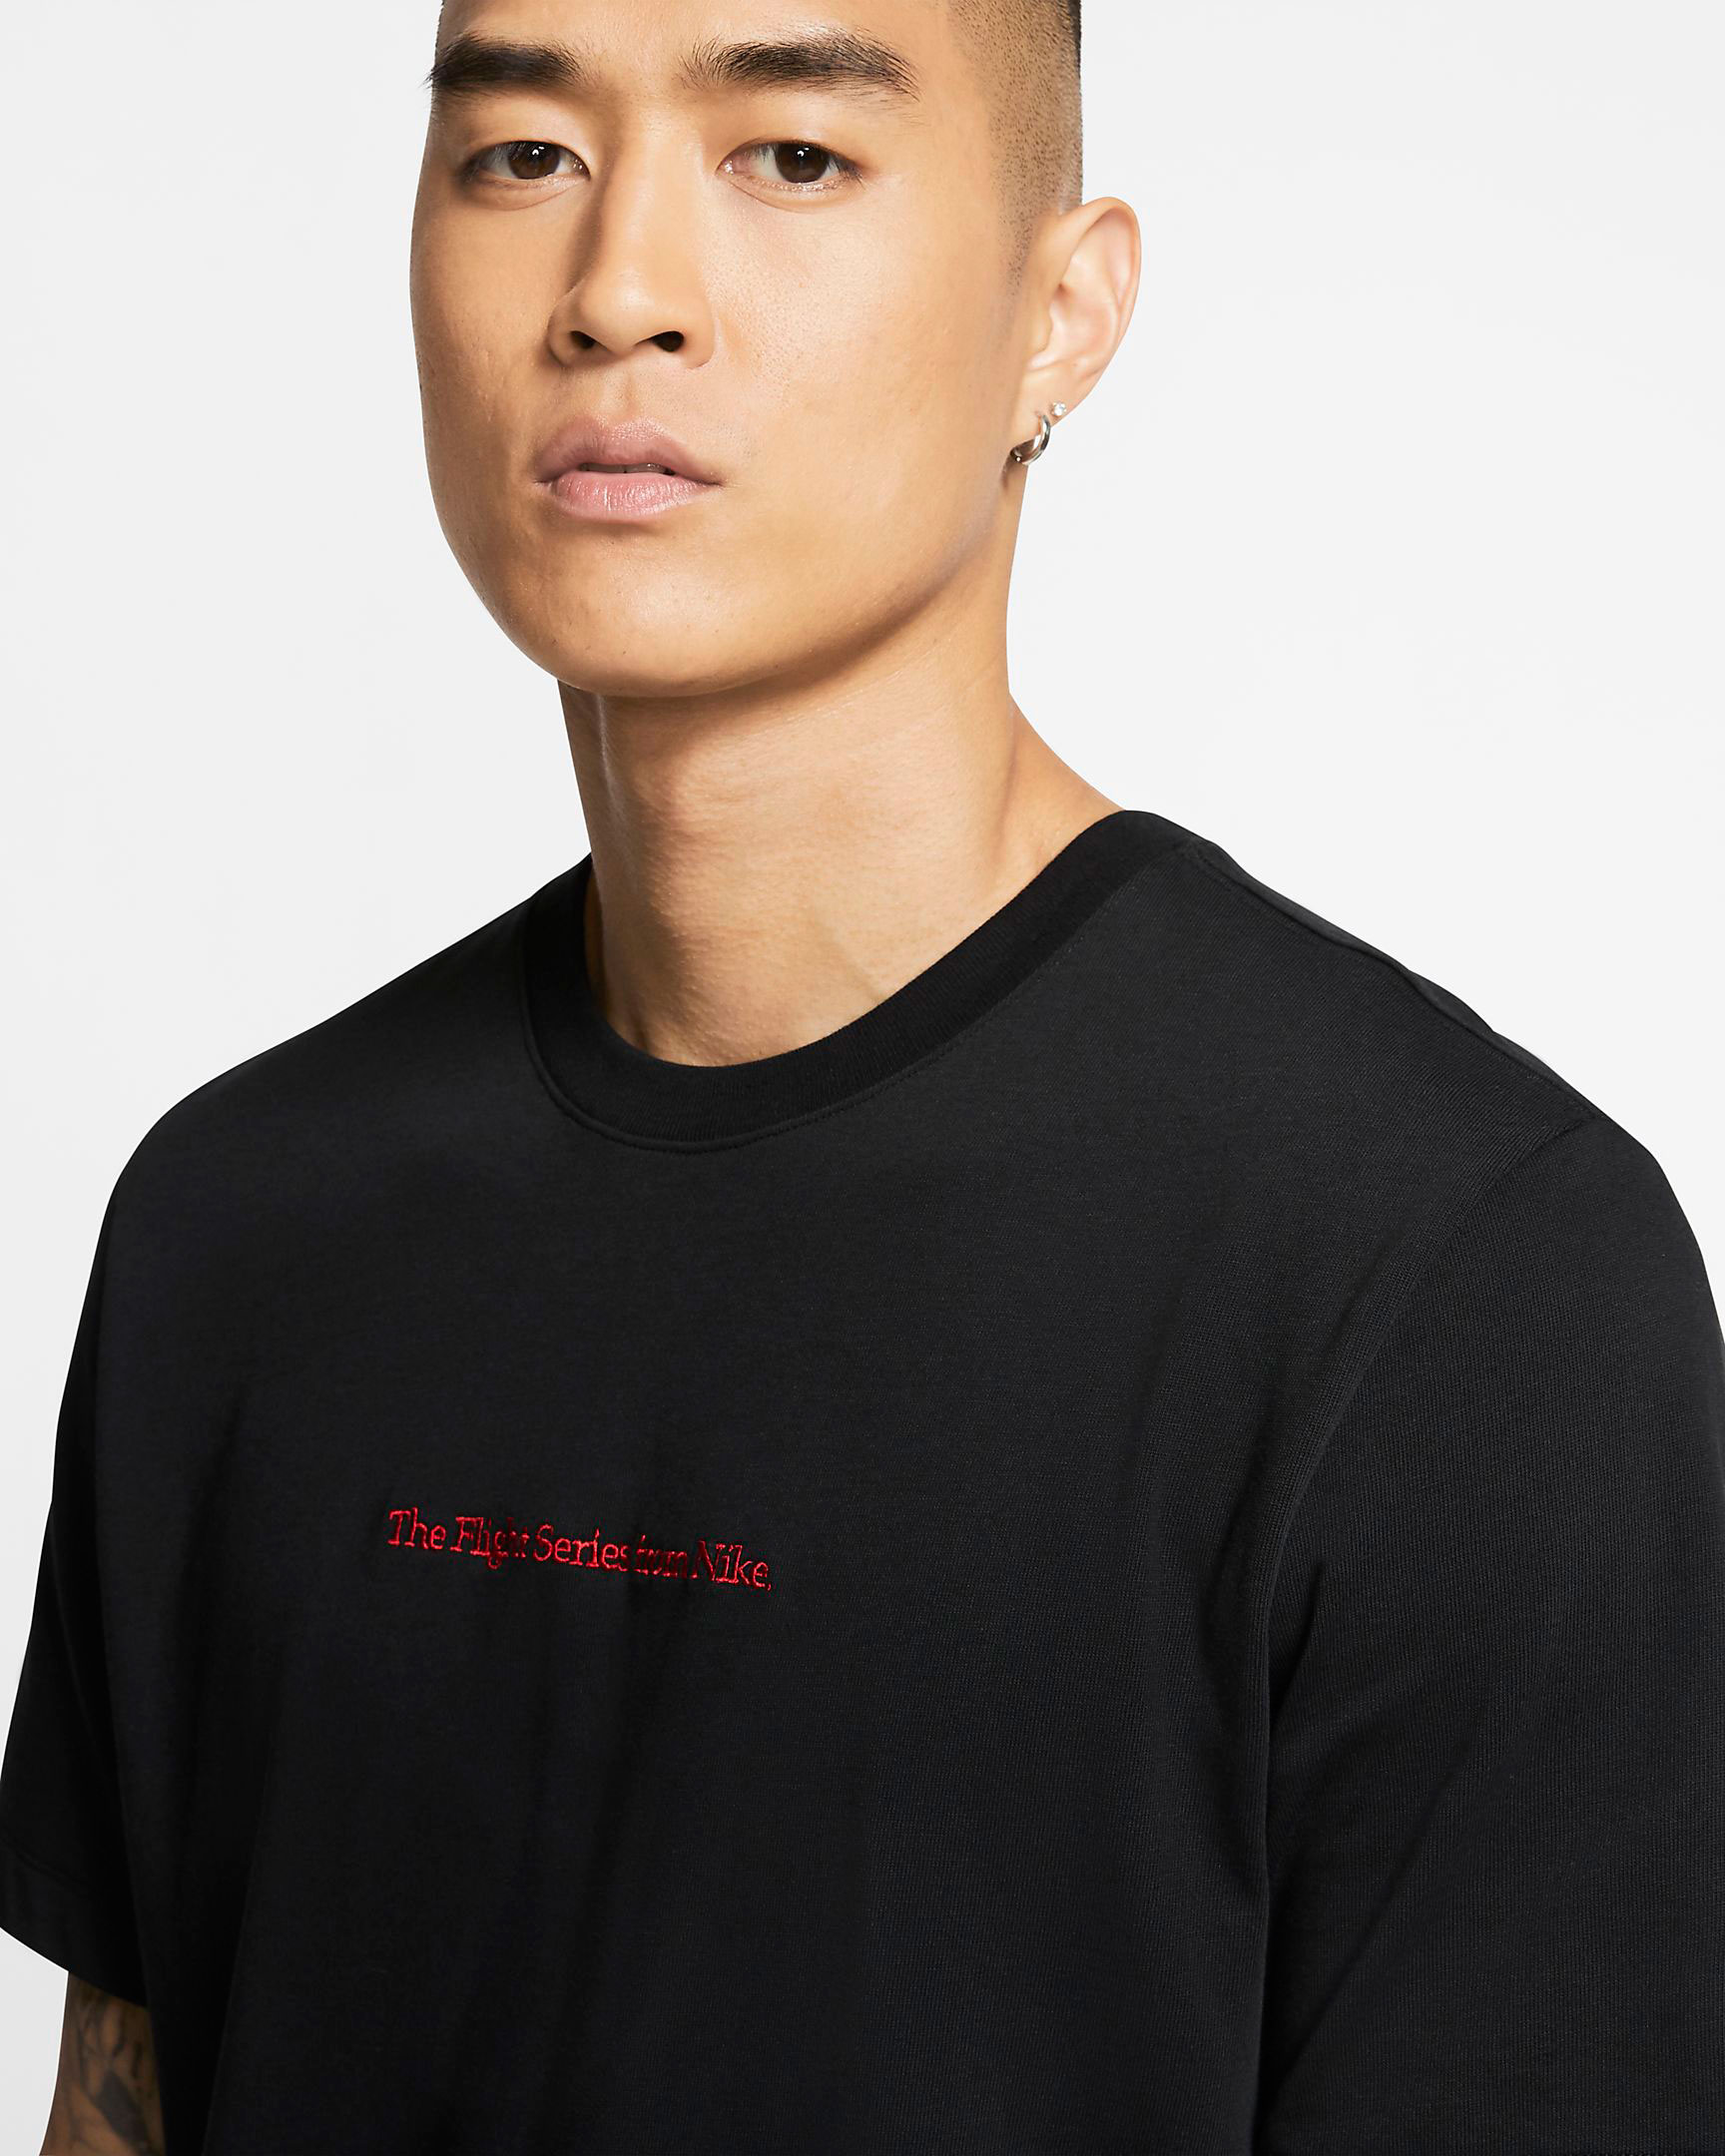 nike-flight-chicago-shirt-2